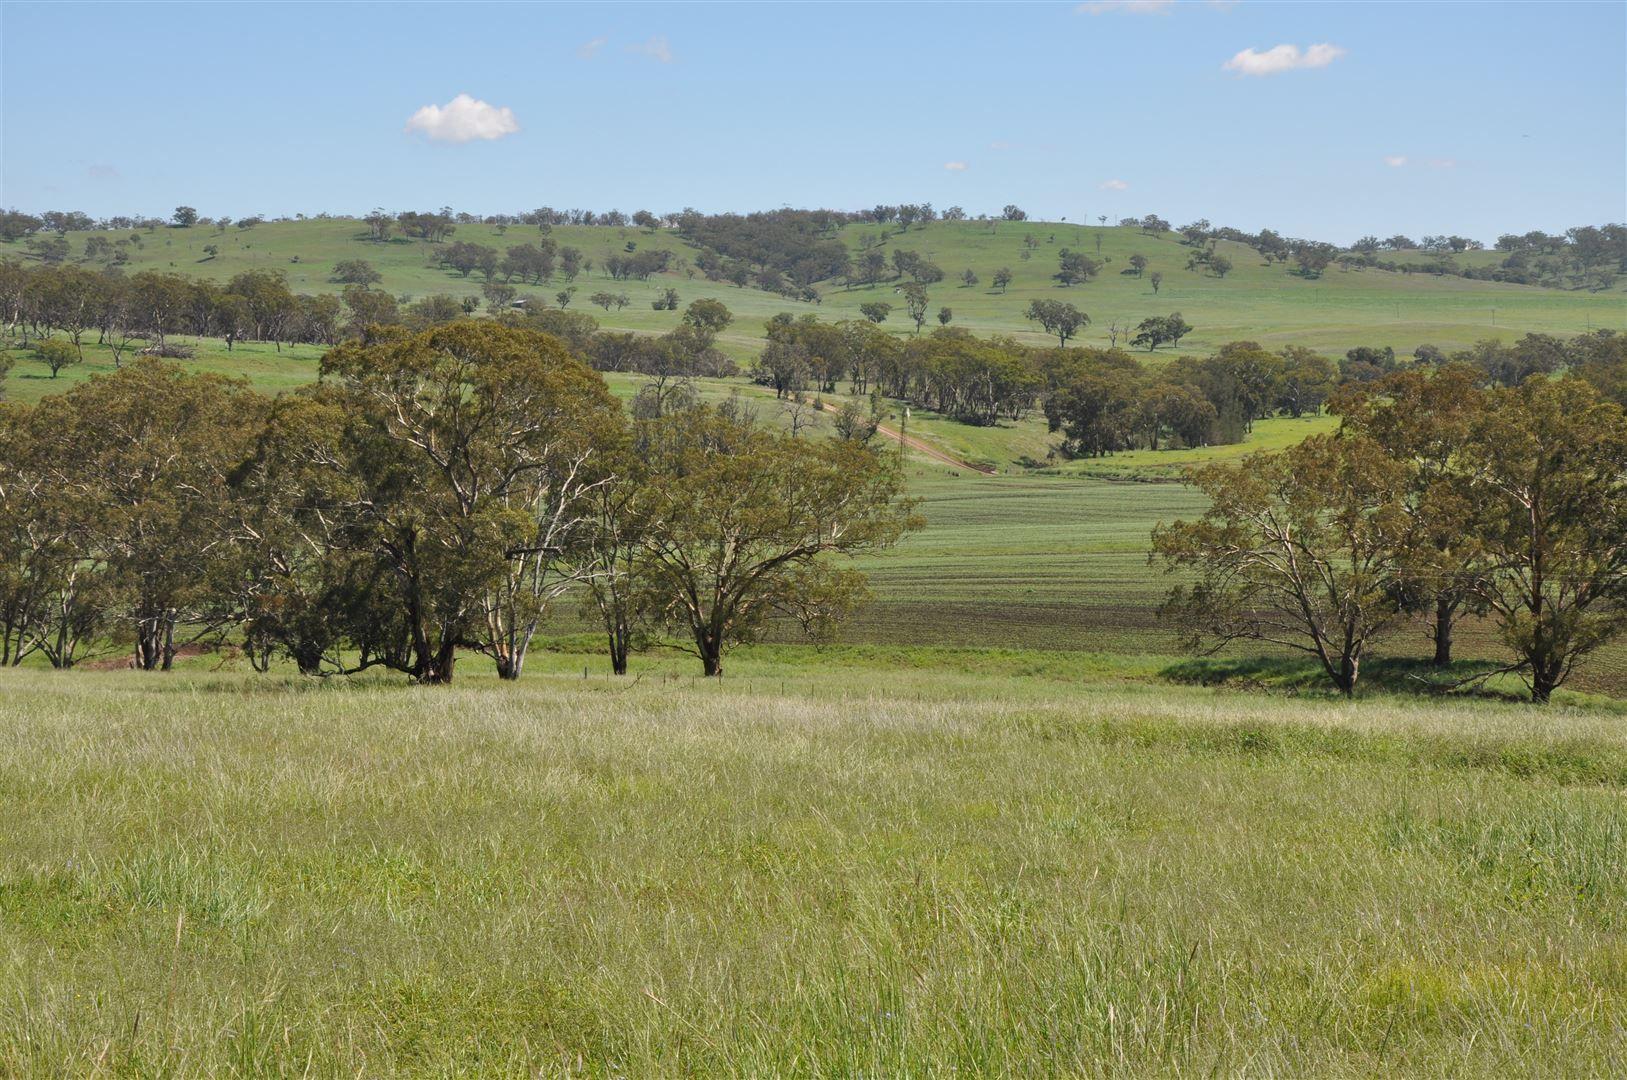 705 Coolah Rd, 'Culbara', Cassilis NSW 2329, Image 0